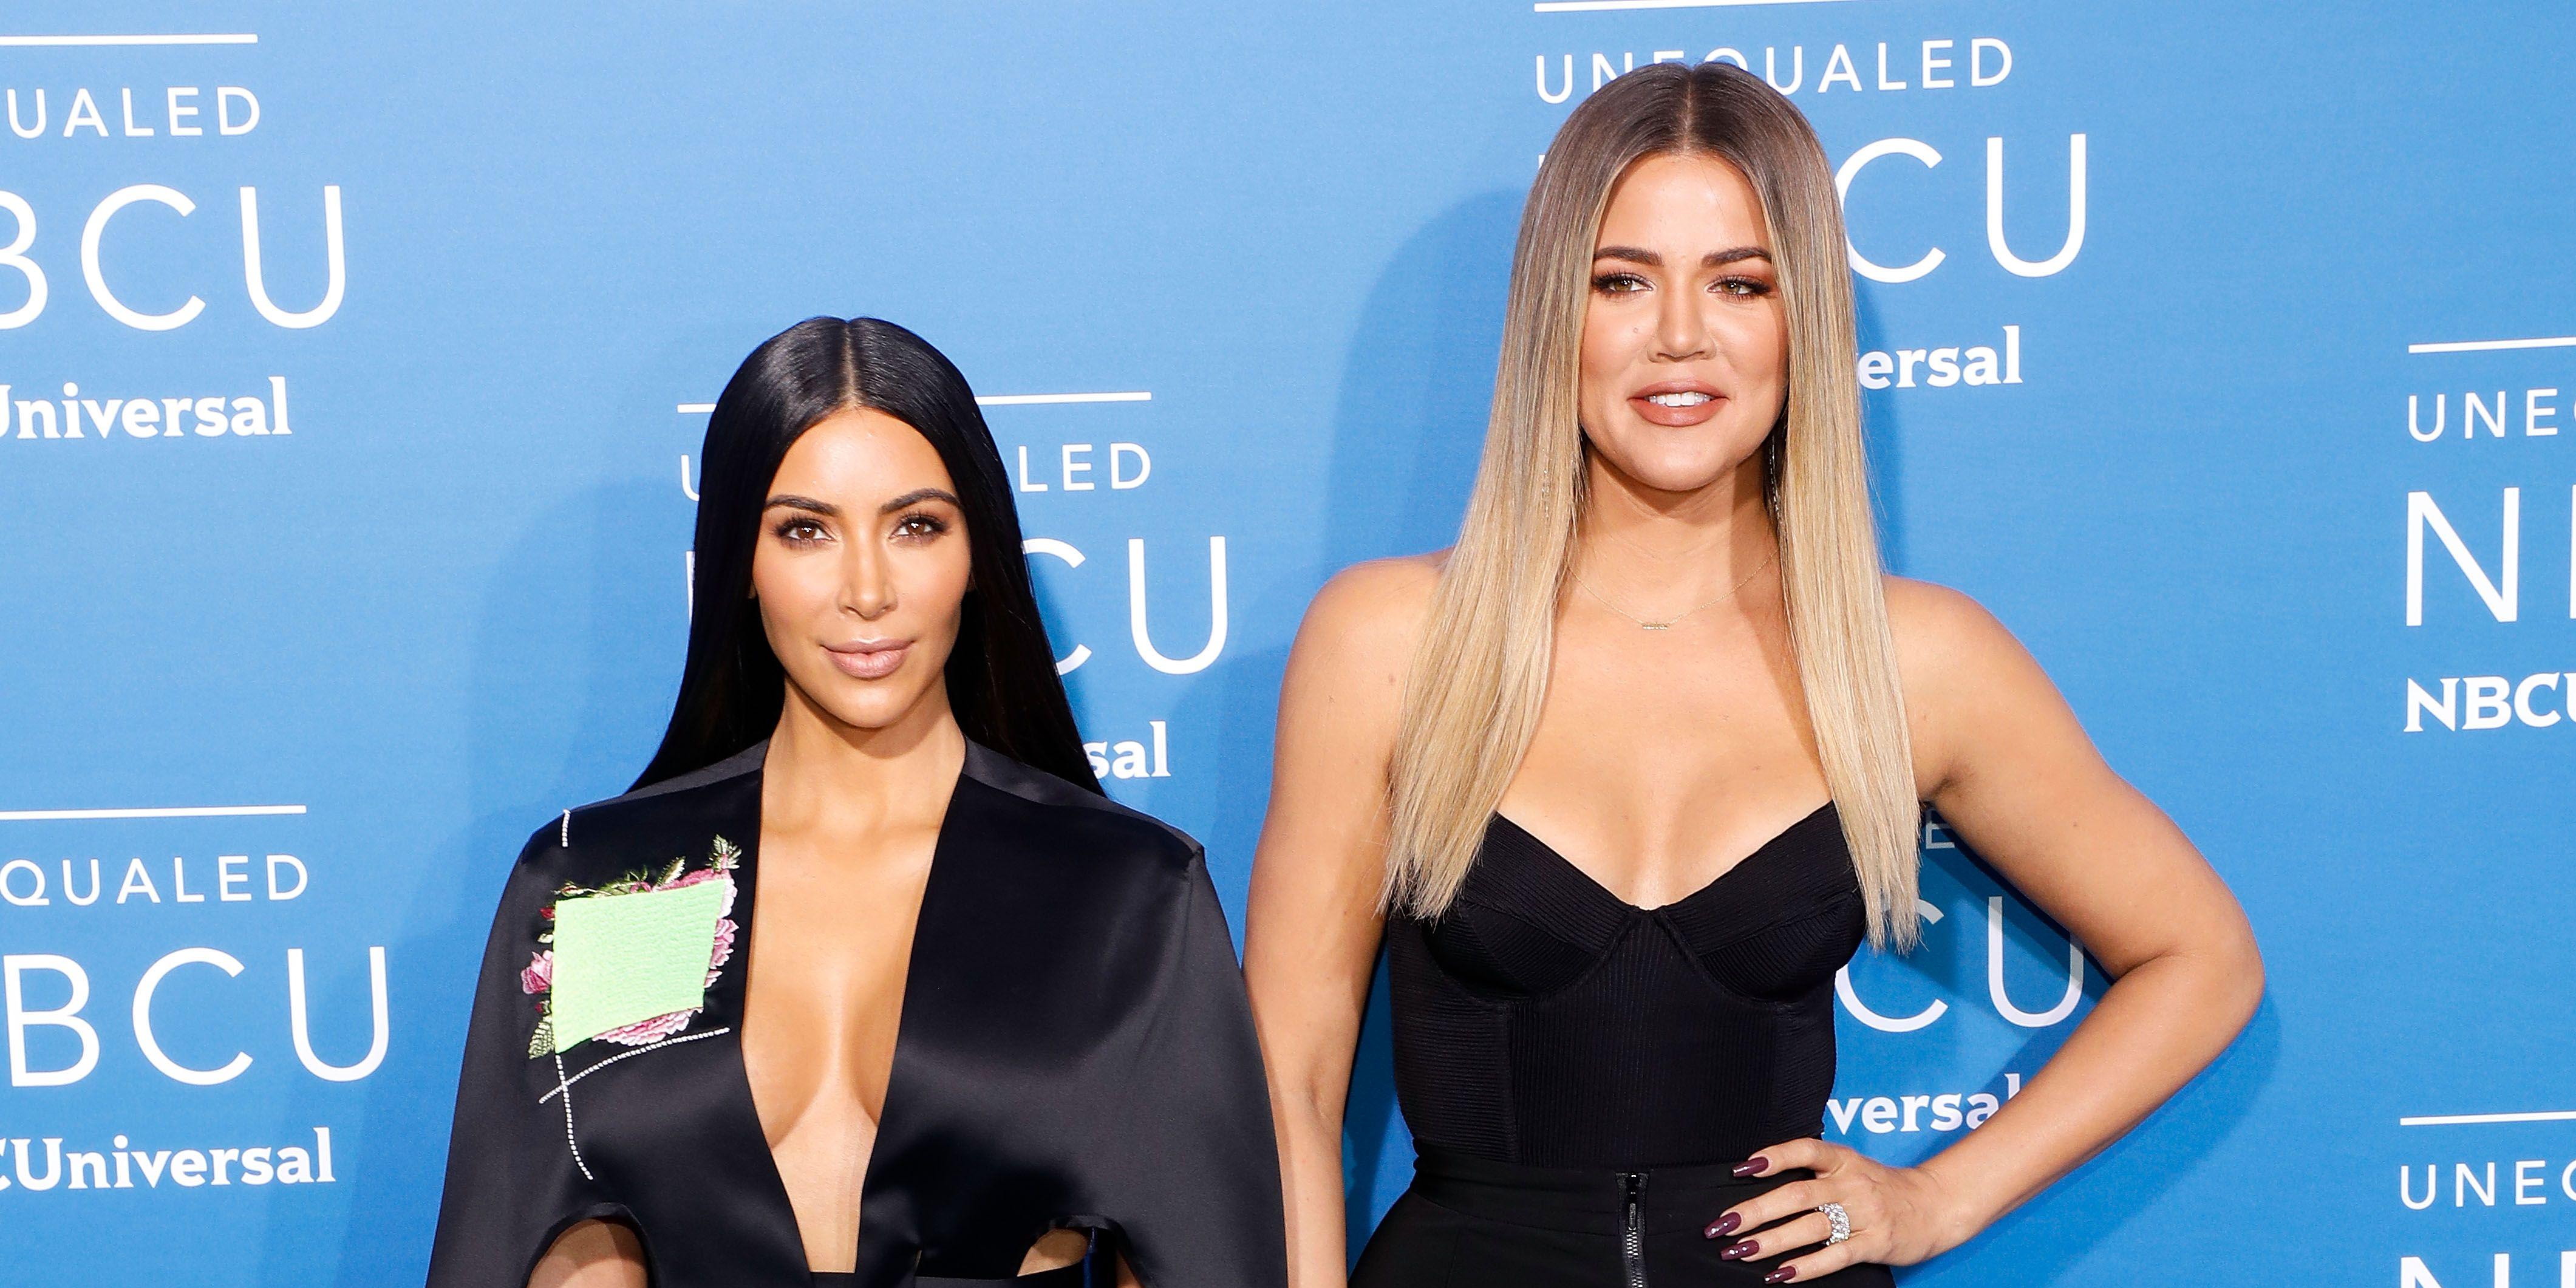 Khloé Kardashian, Kim Kardashian, TristanThompson,Ellen DeGeners, roddels, update